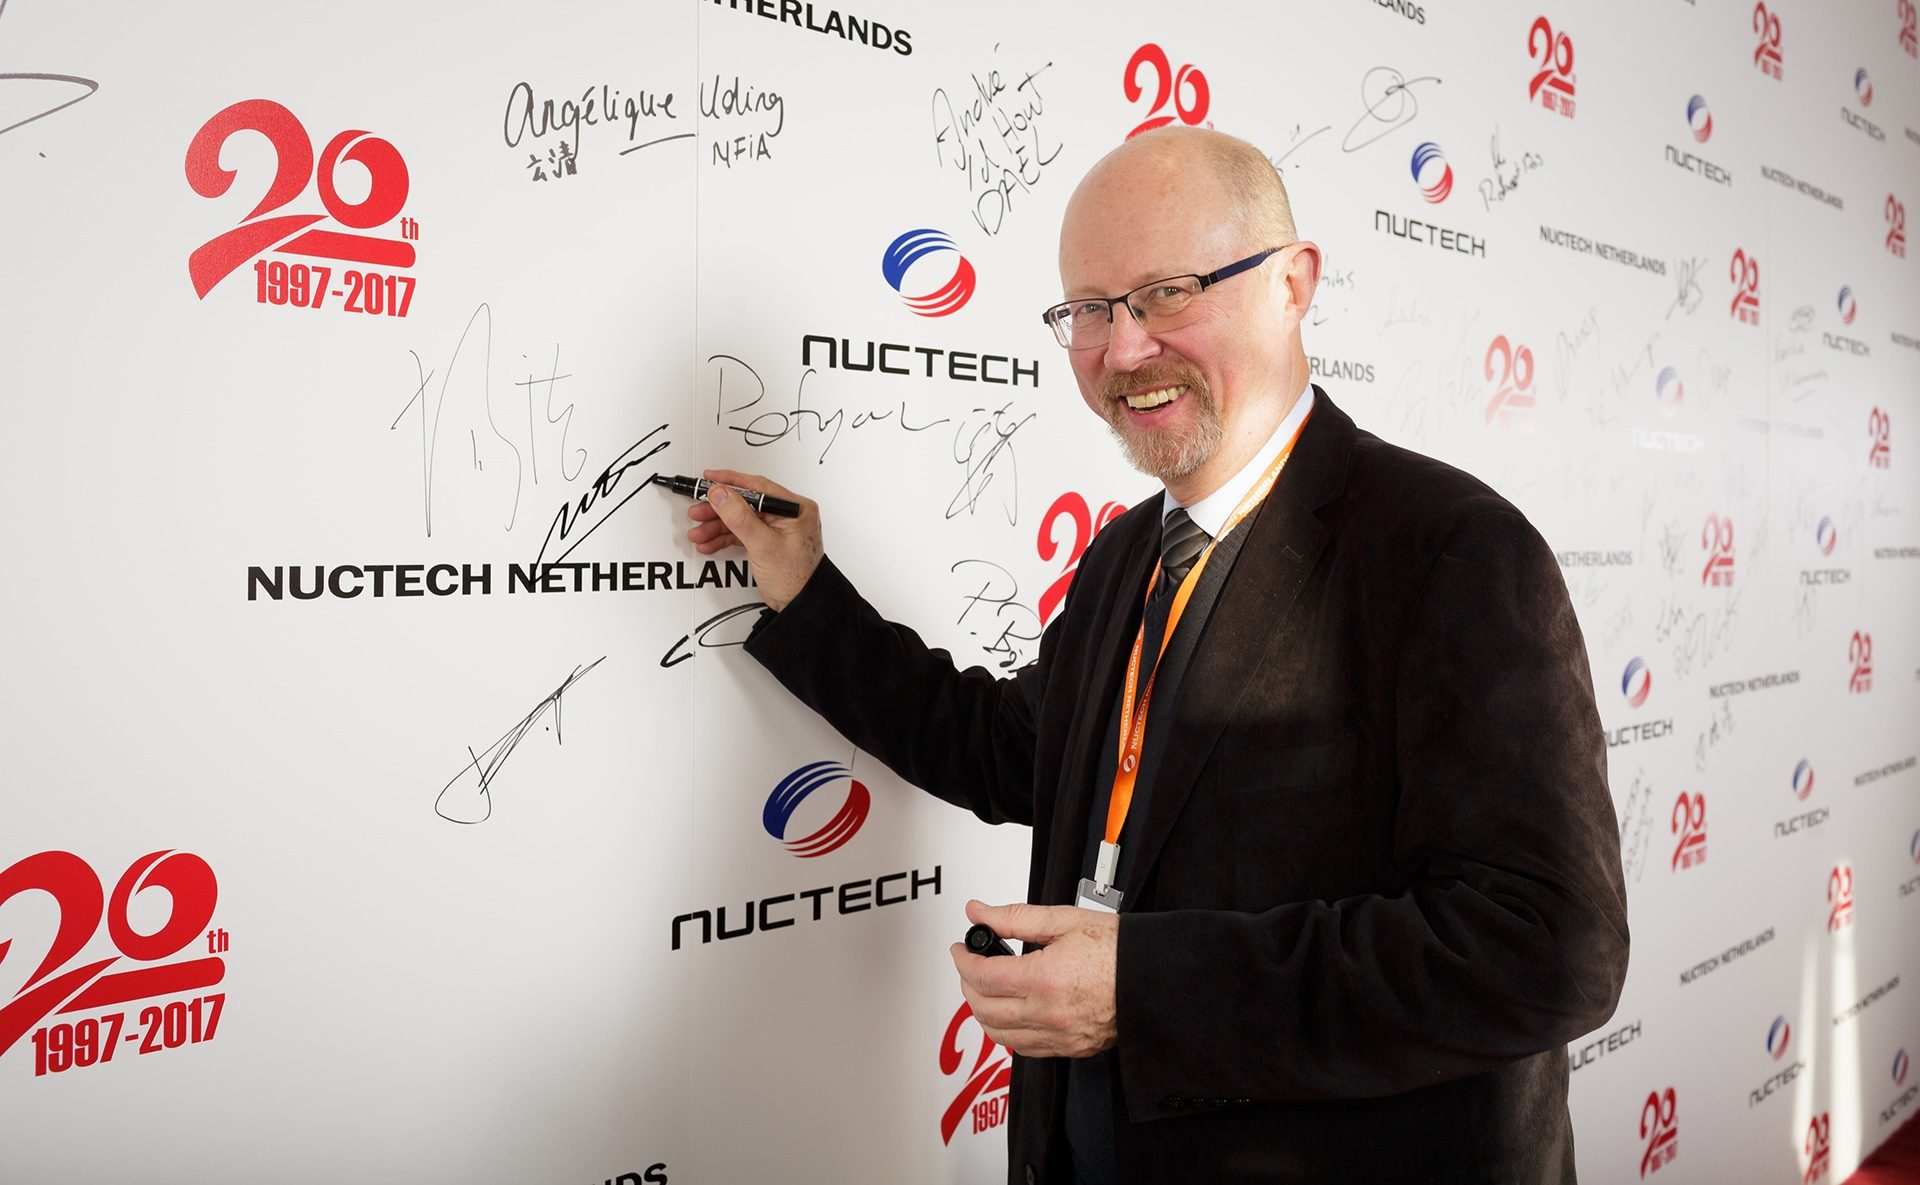 Vytautas Vitkauskas (Inta) at Nuctech 20 Anniversary